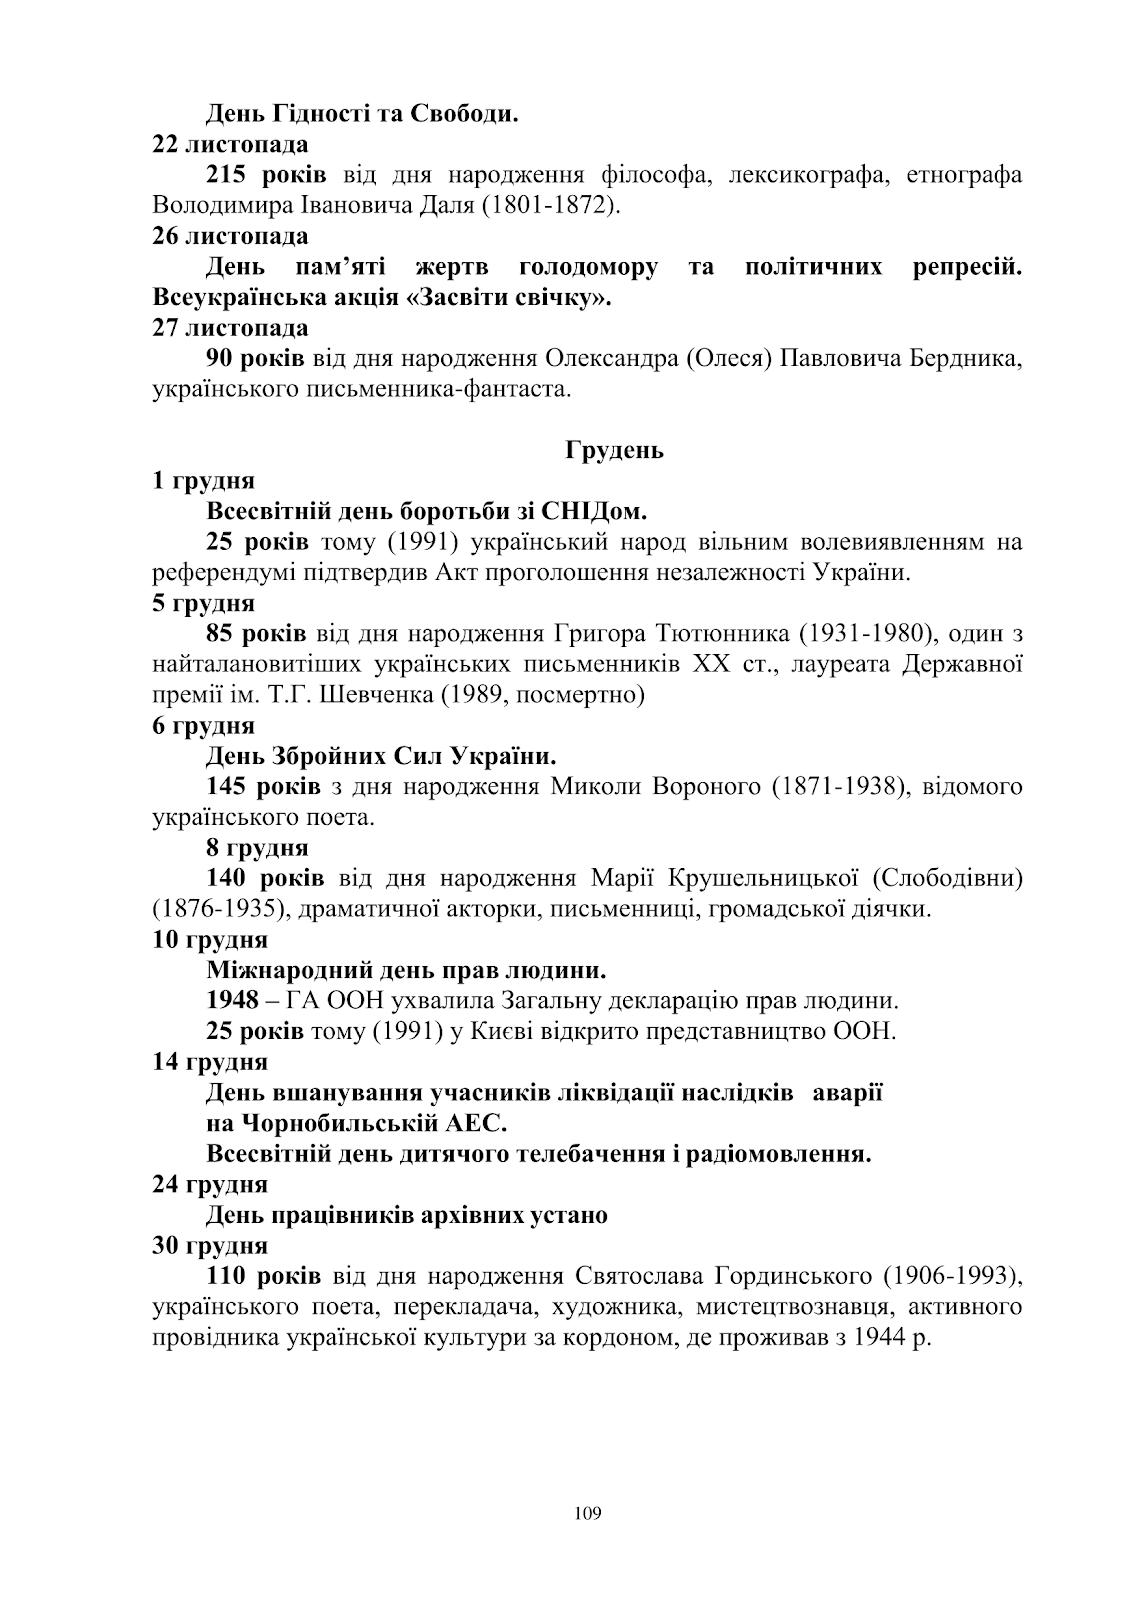 C:\Users\Валерия\Desktop\план 2016 рік\план 2016 рік-109.png